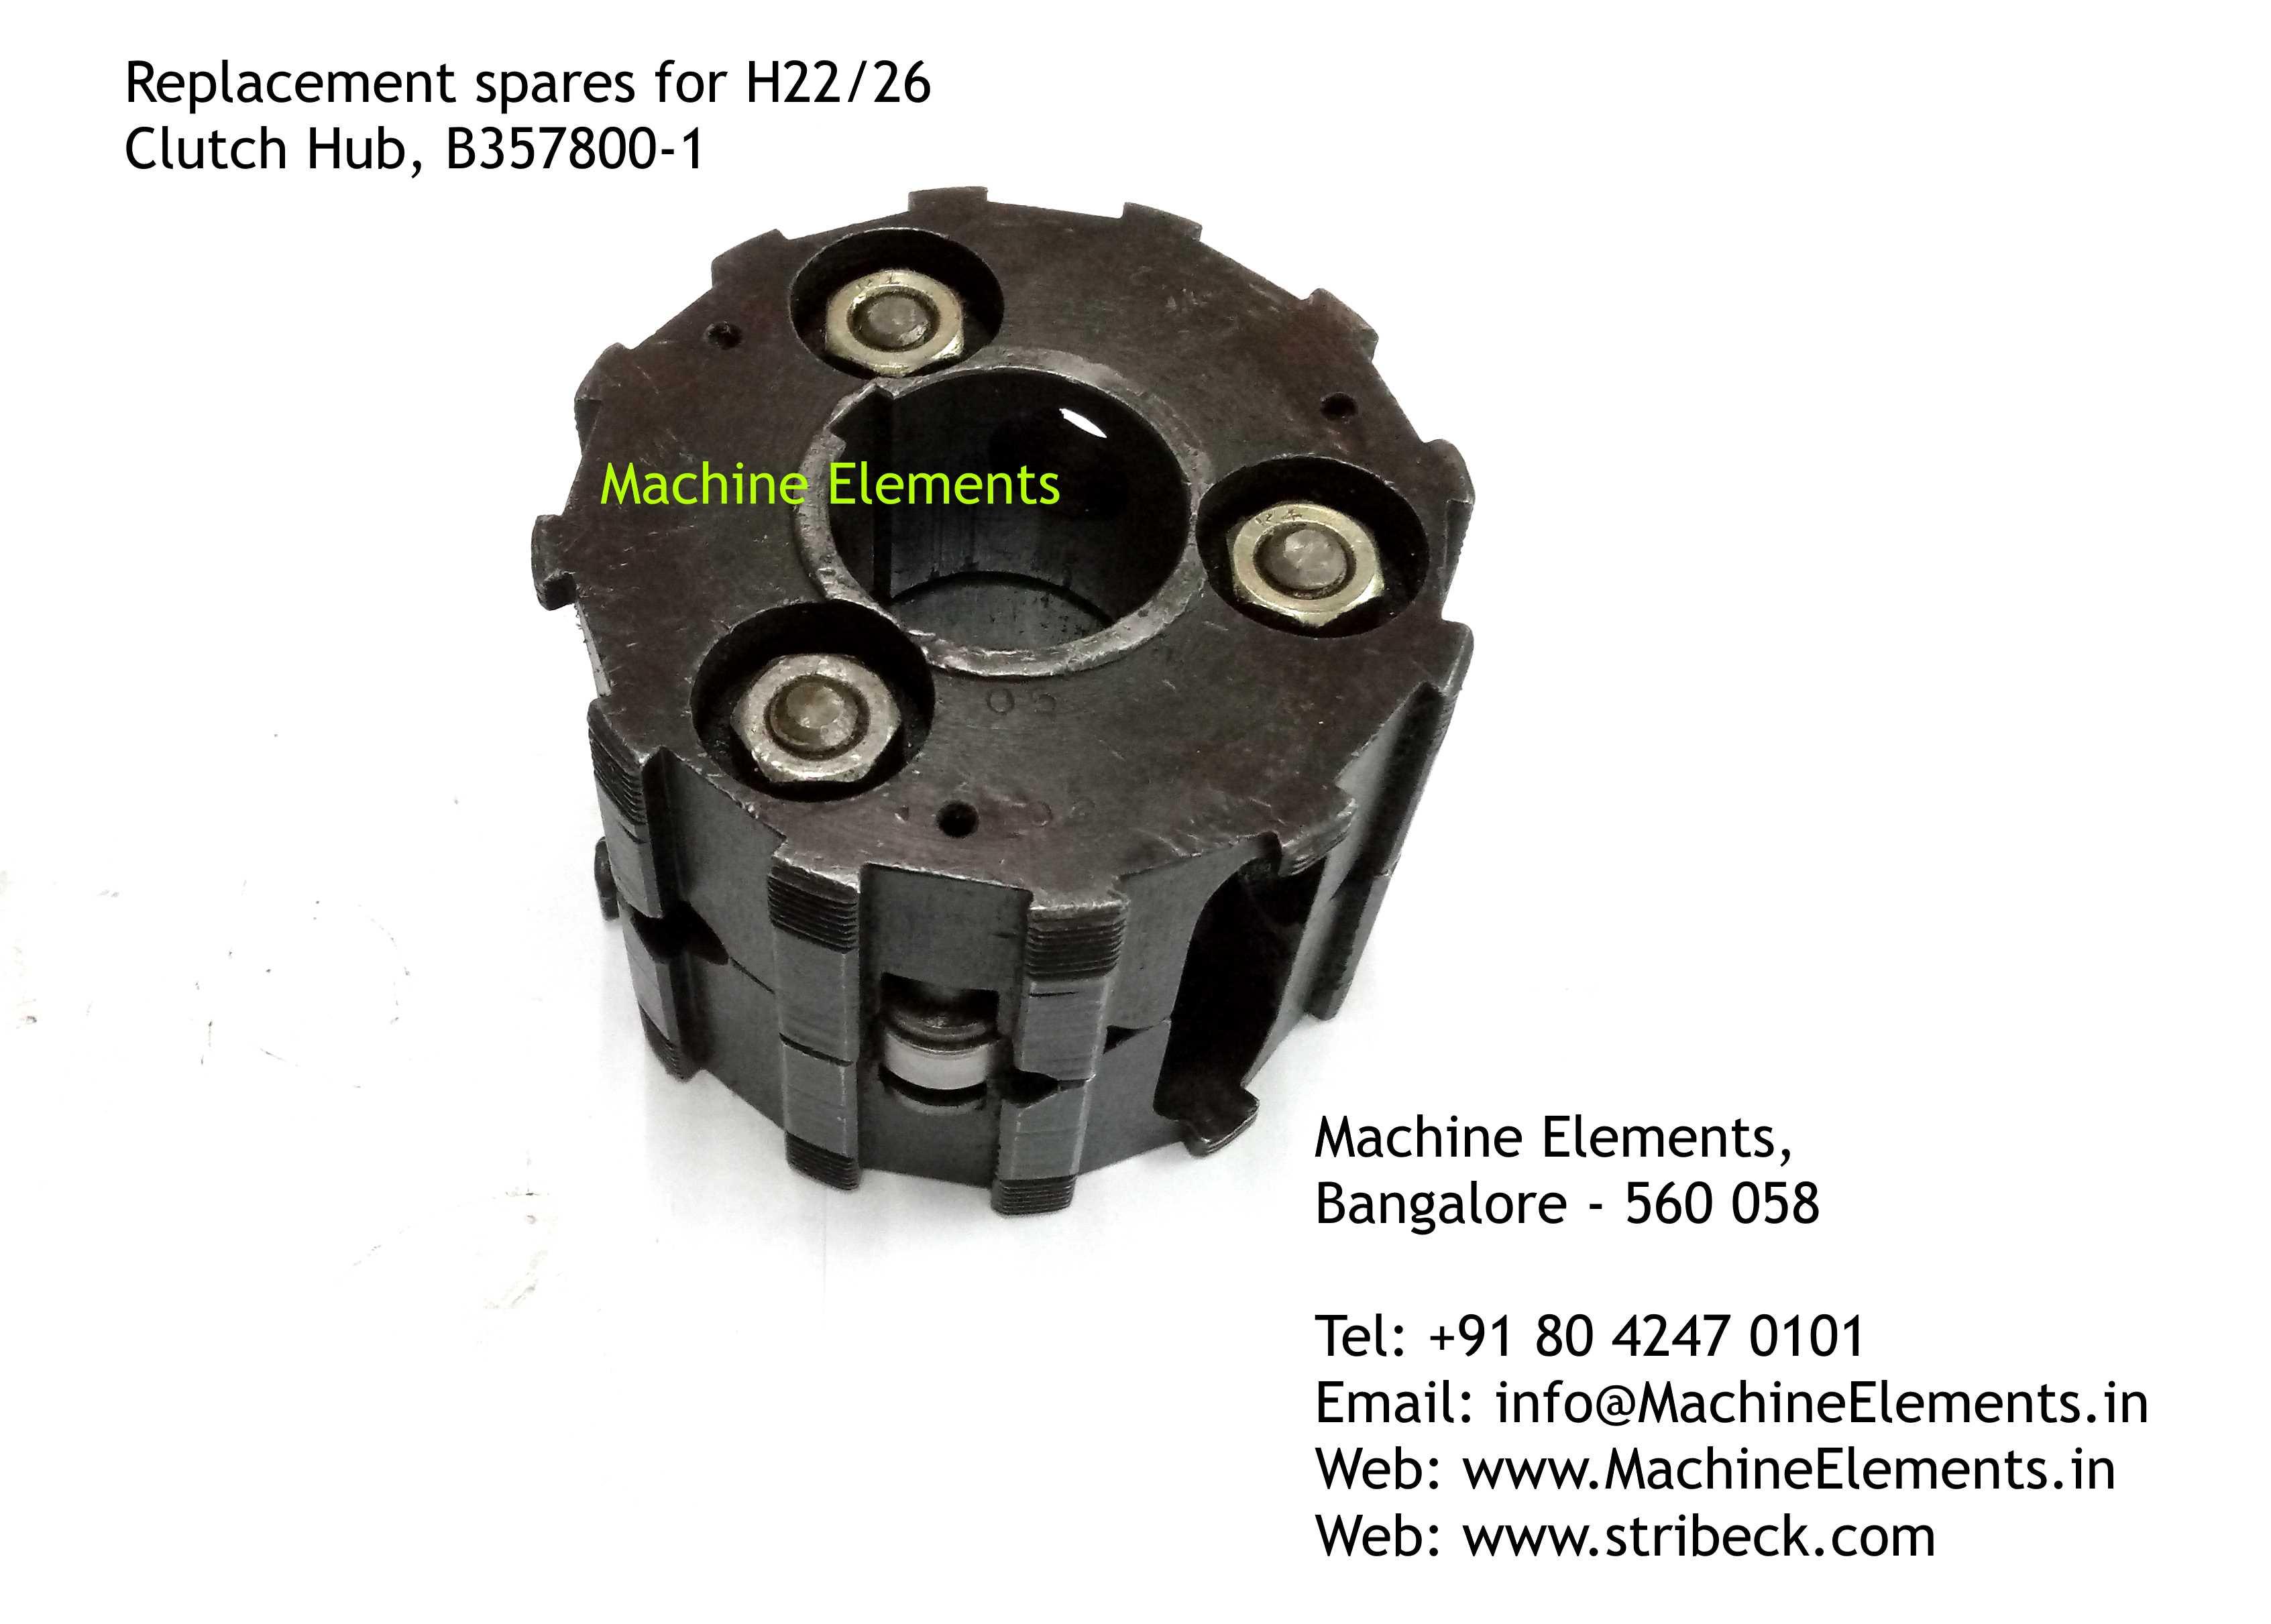 Clutch Hub, B357800-1